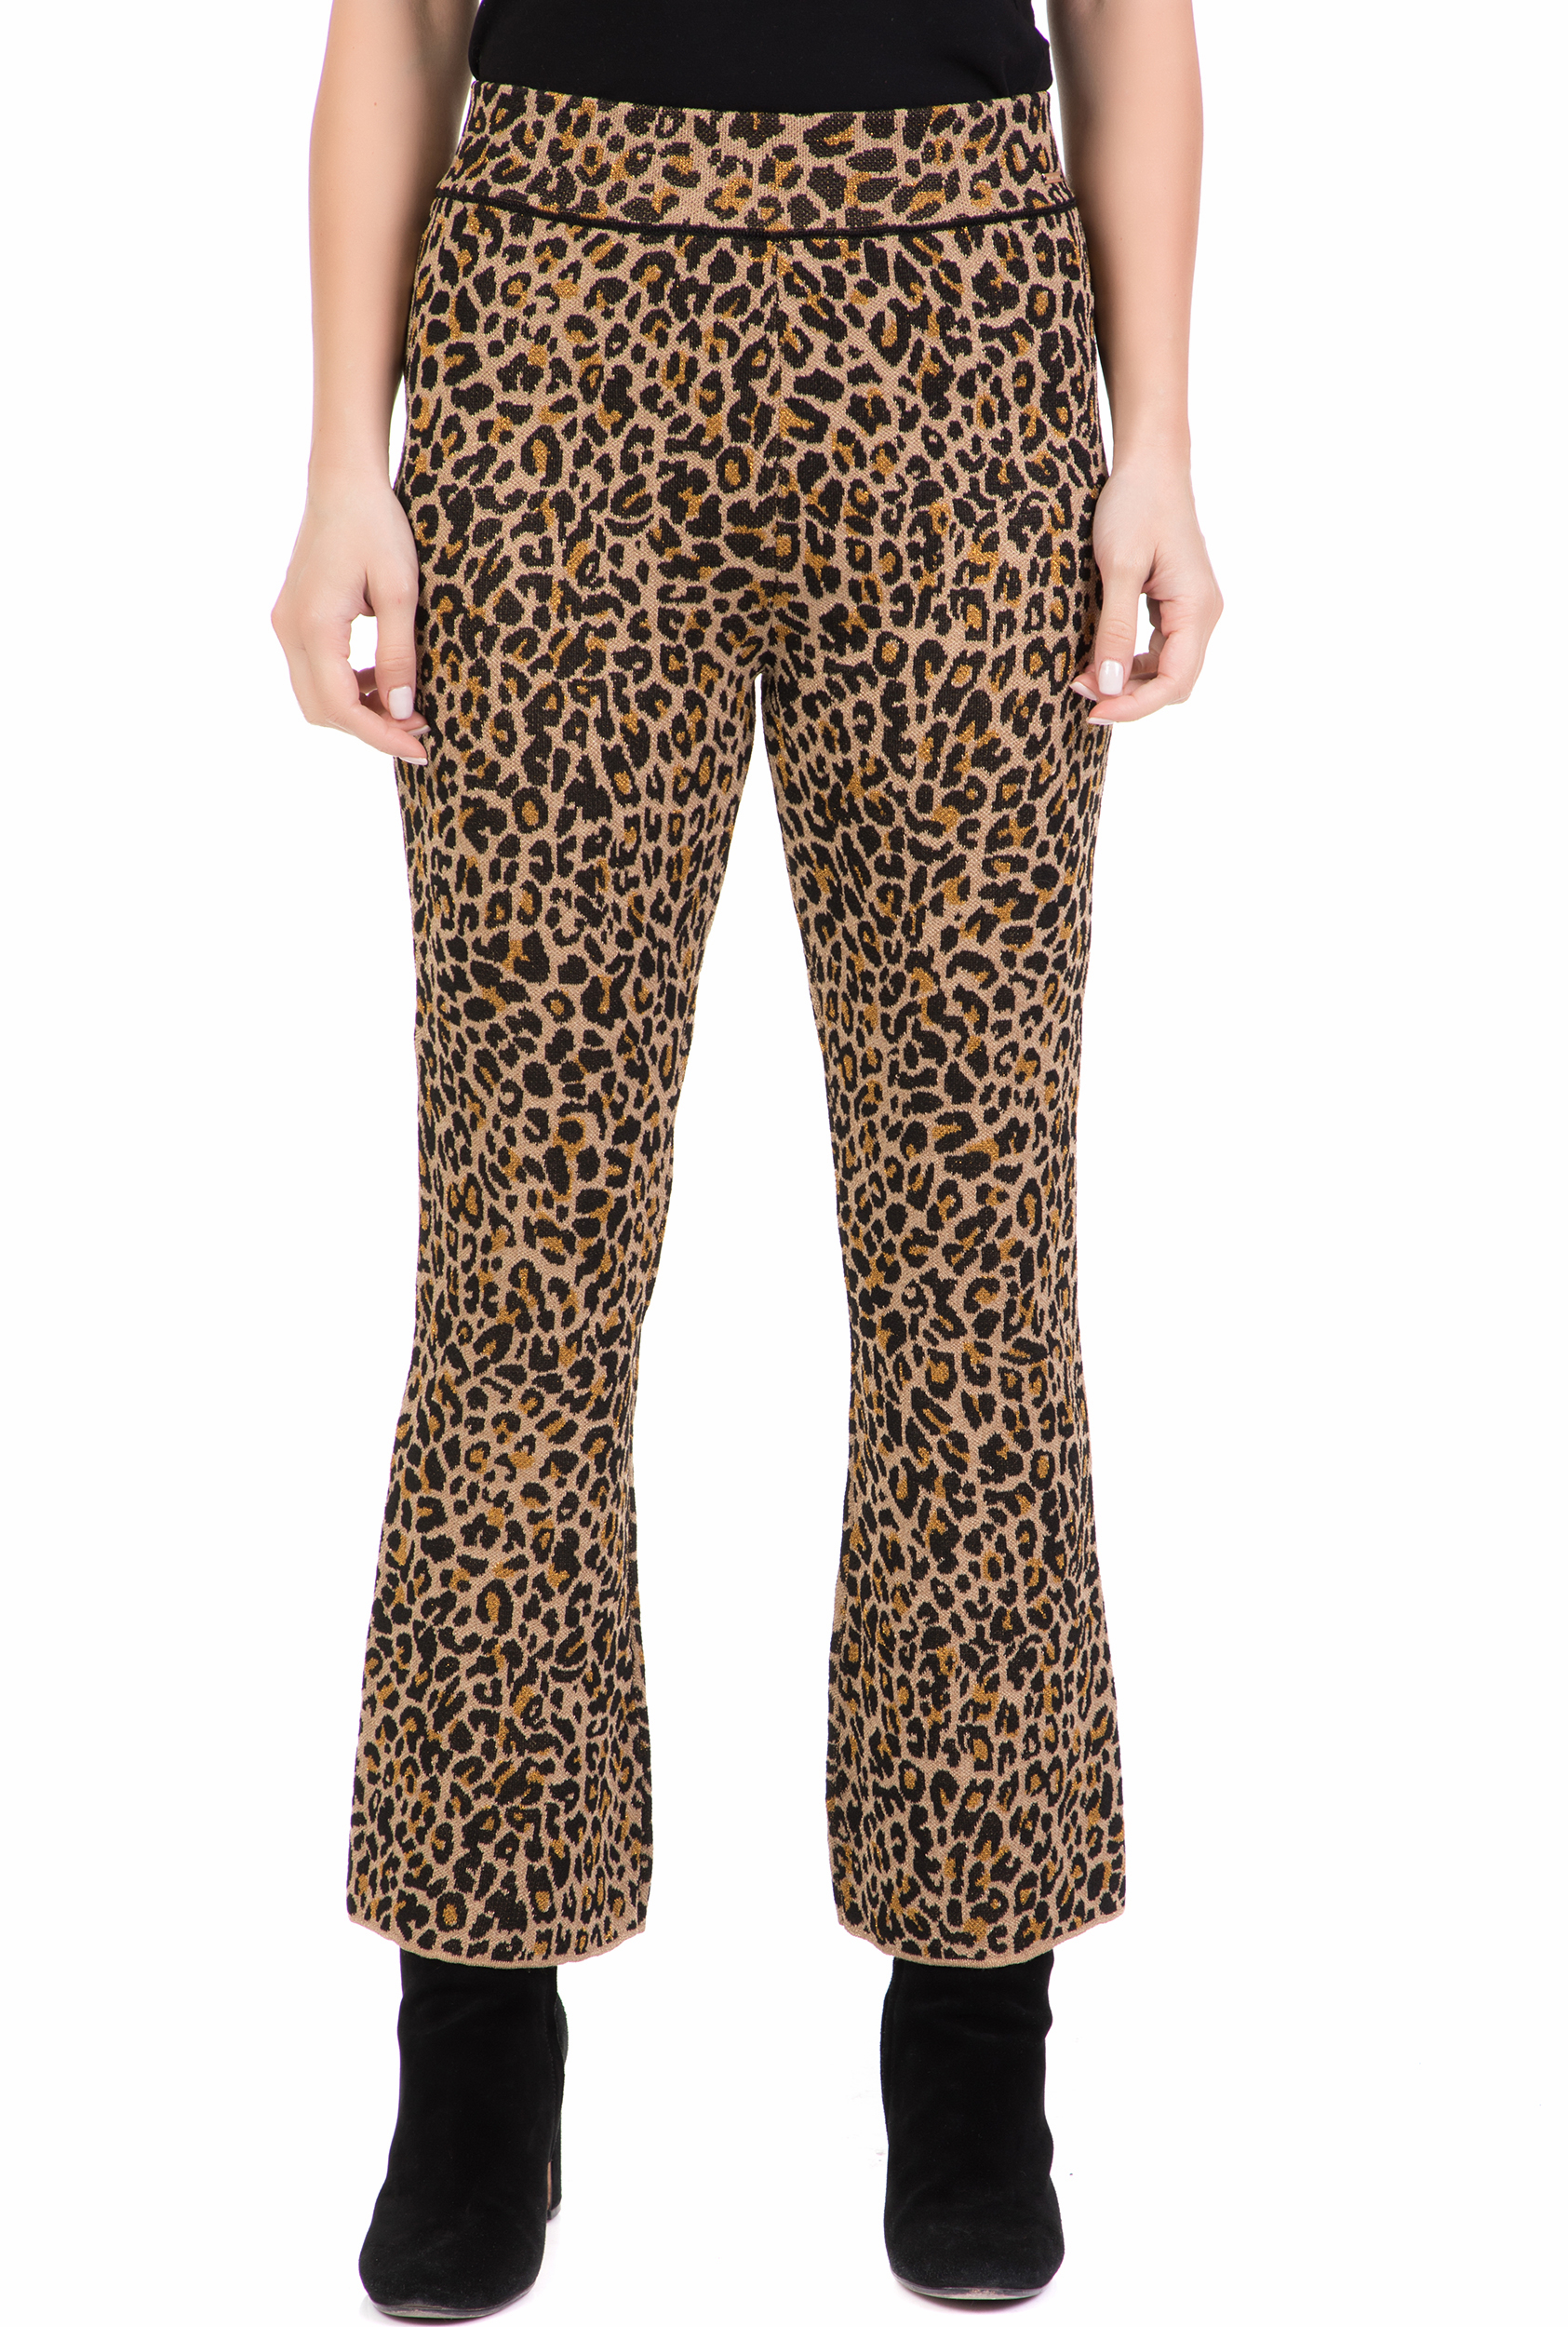 NENETTE - Γυναικείο παντελόνι NENETTE λεοπάρ